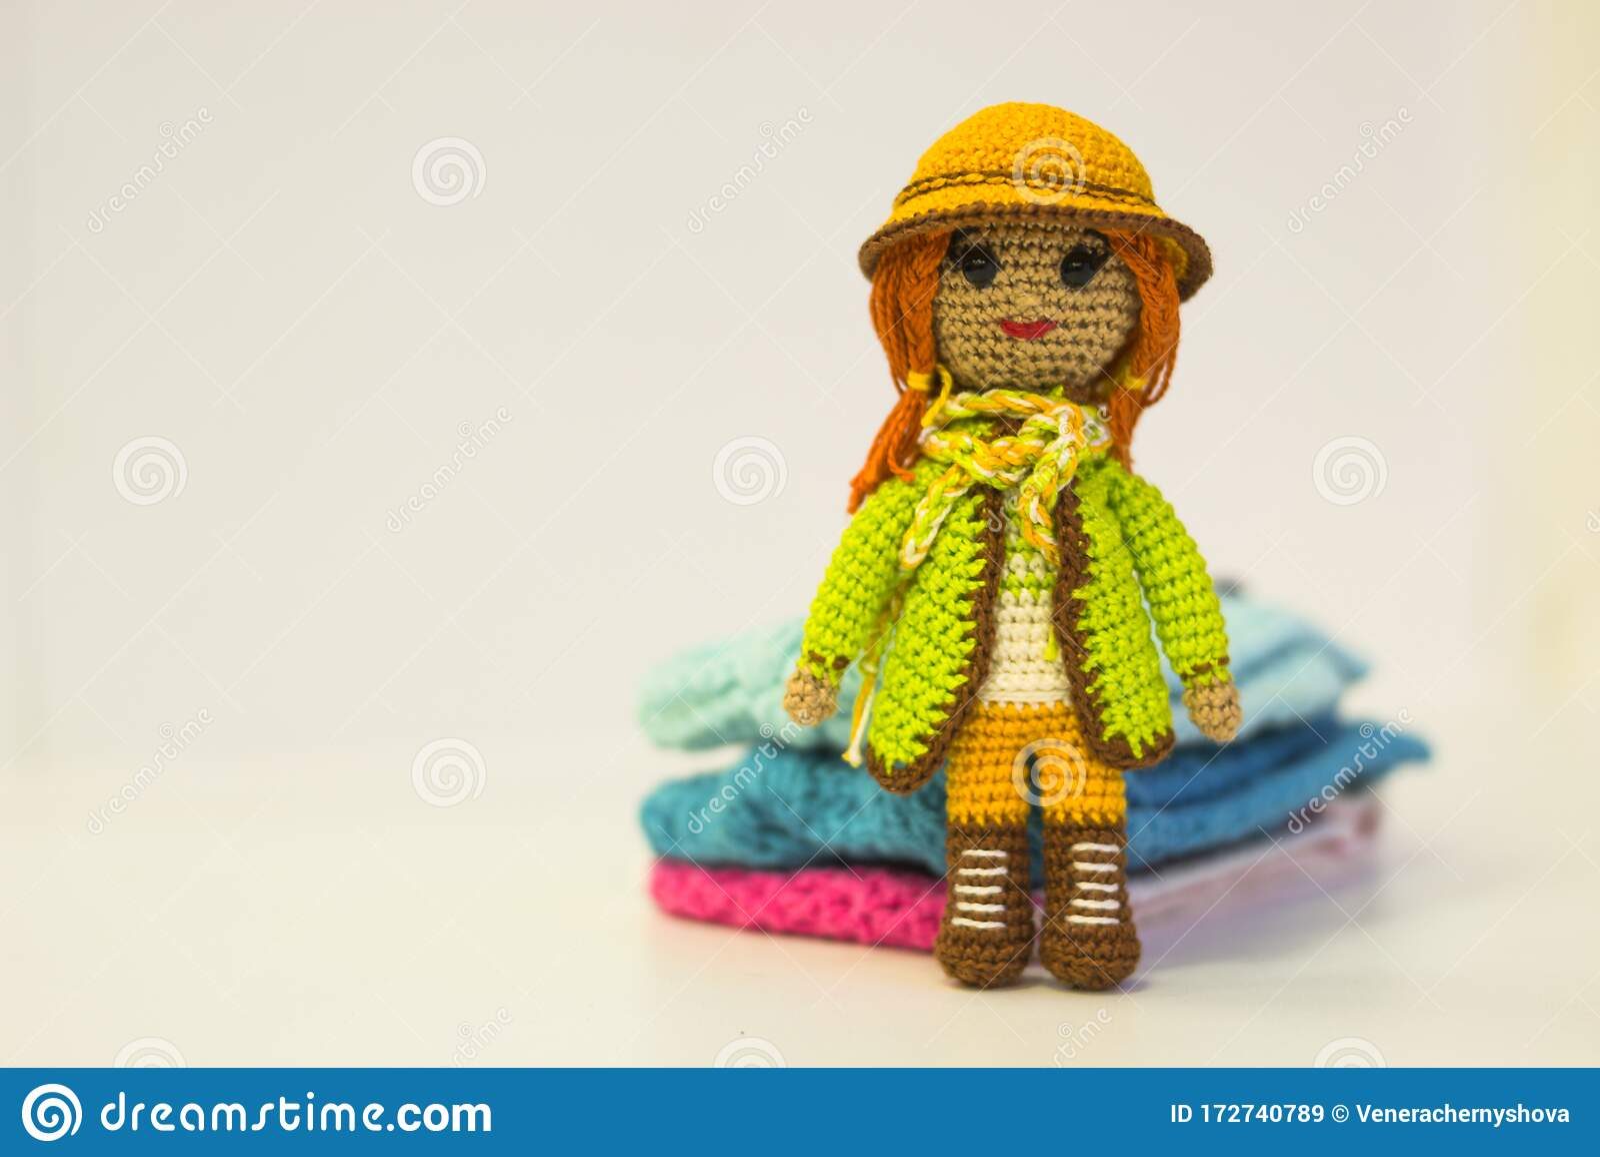 Amazing Beauty Amigurumi Doll and Animal Pattern Ideas | Amigurumi ... | 1155x1600